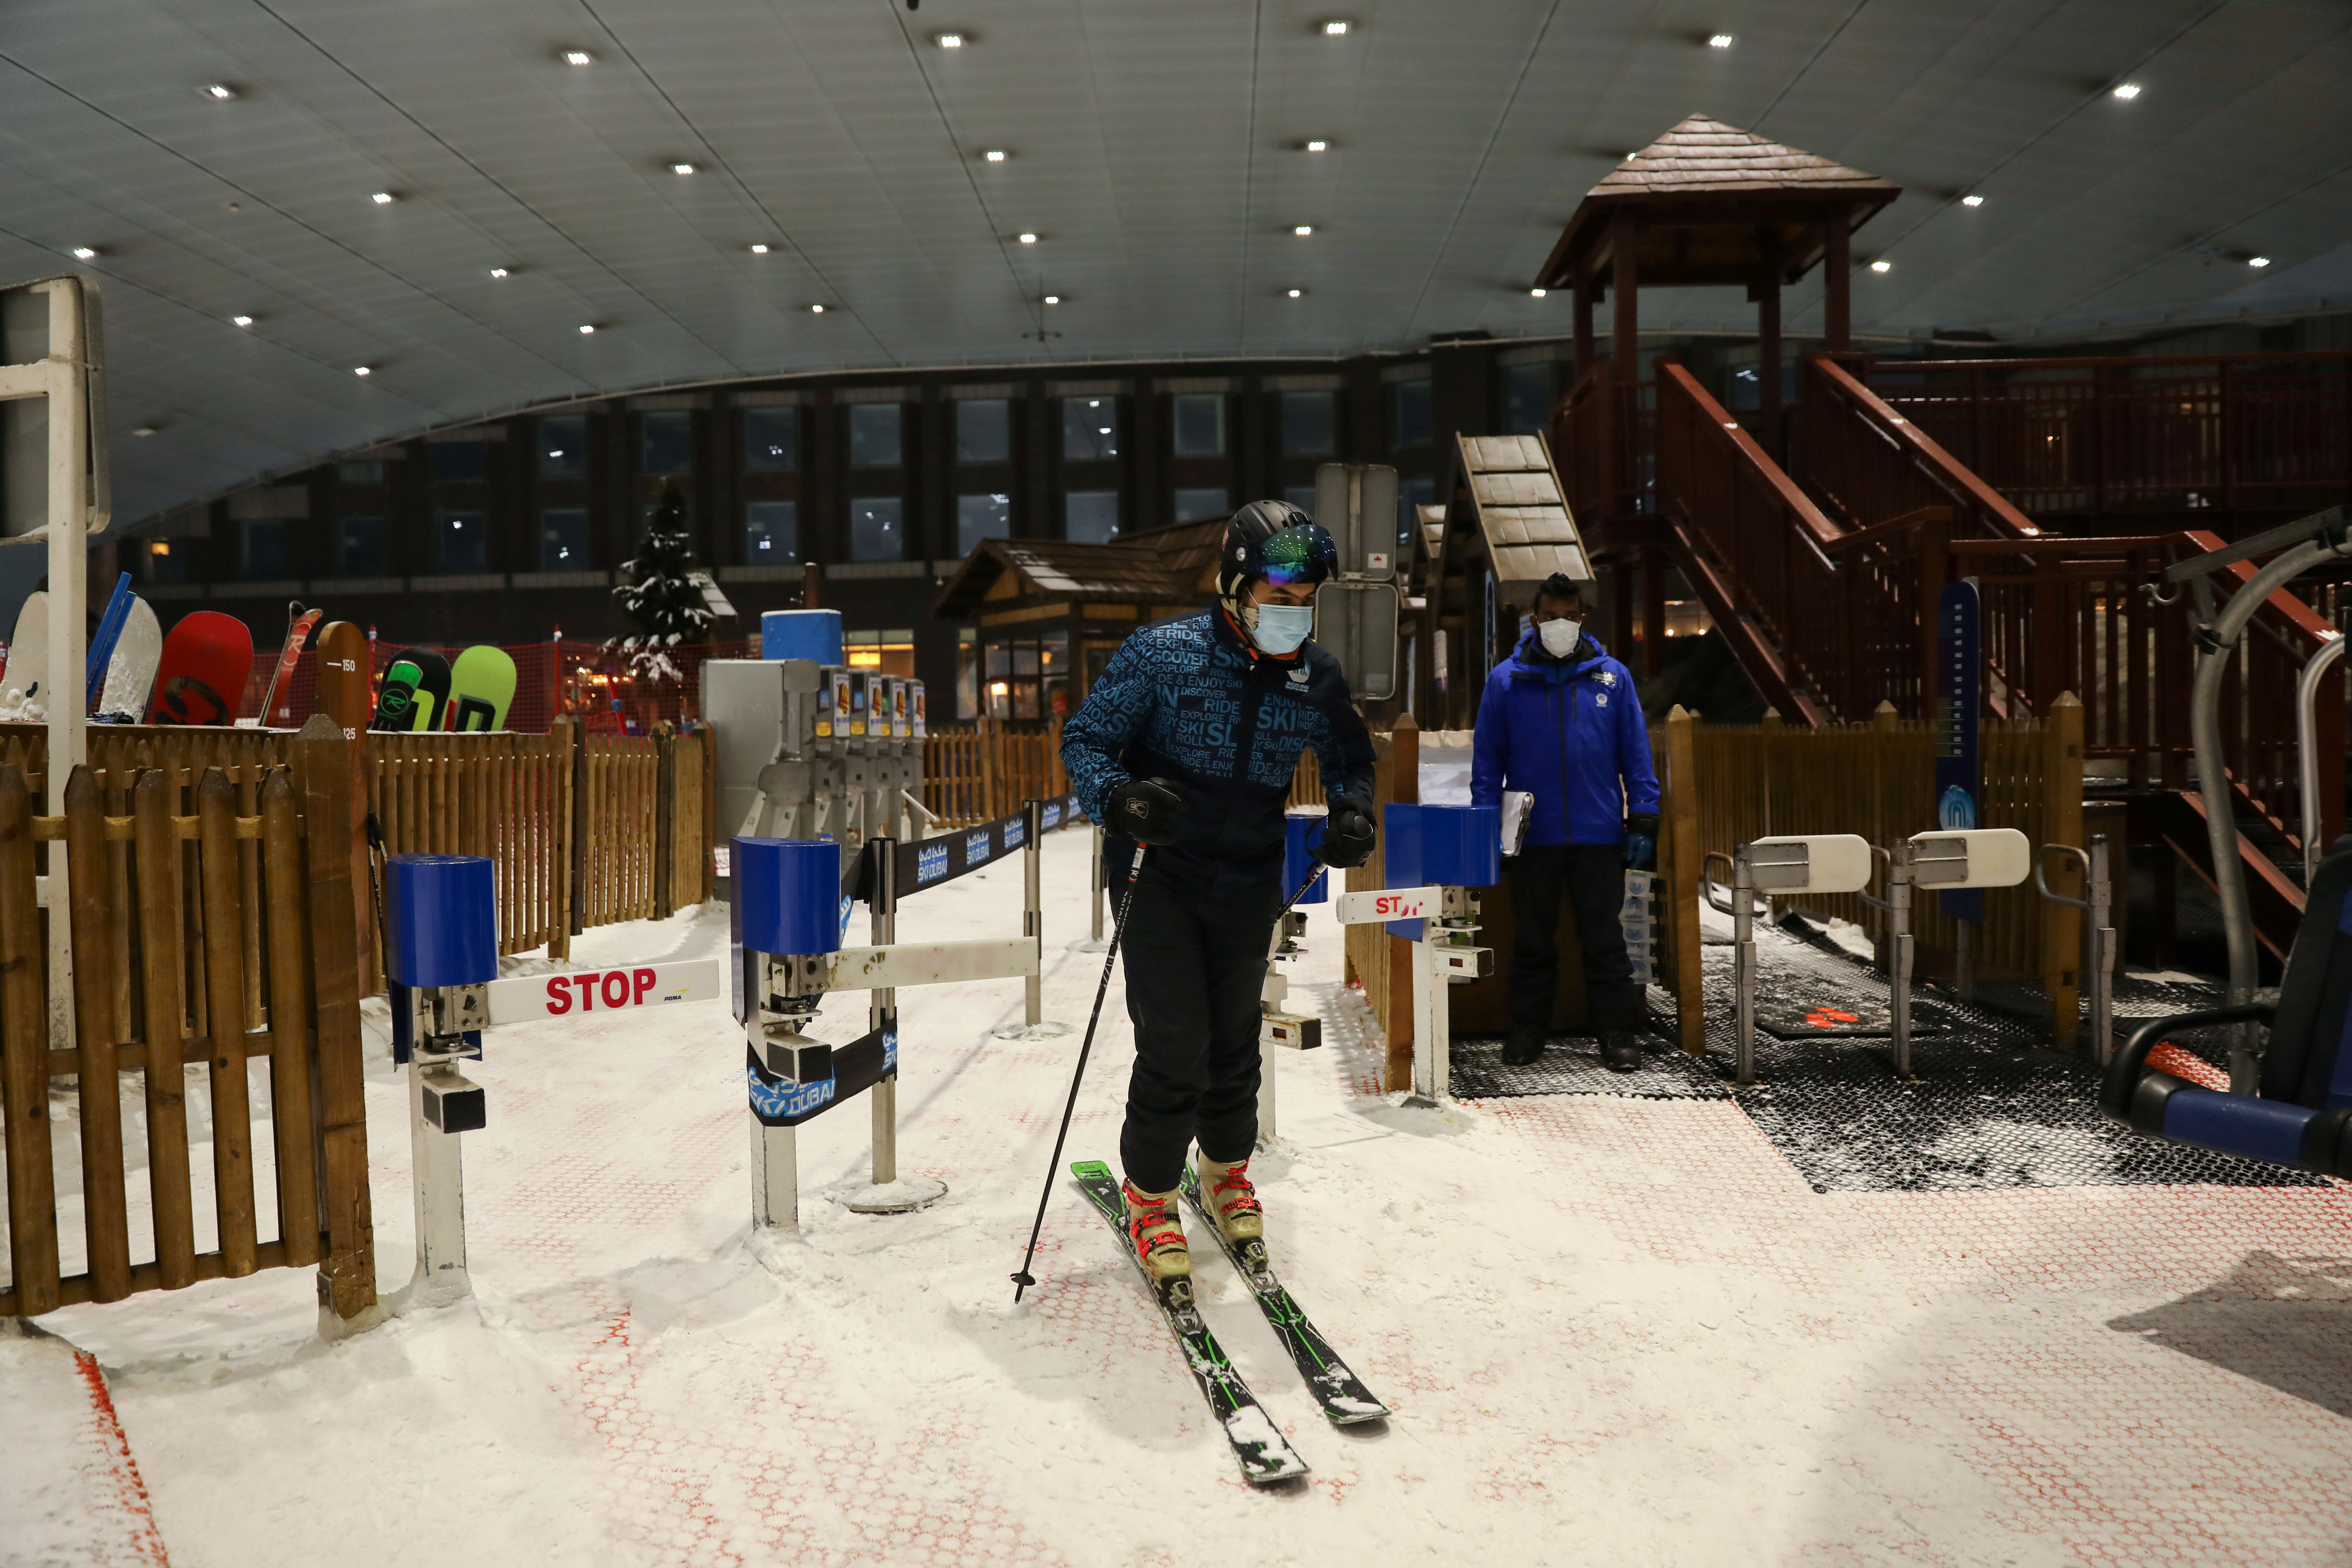 A man wearing a protective face mask gets ready to ski at Ski Dubai, following the outbreak COVID-19 in Dubai, United Arab Emirates, May 28, 2020.